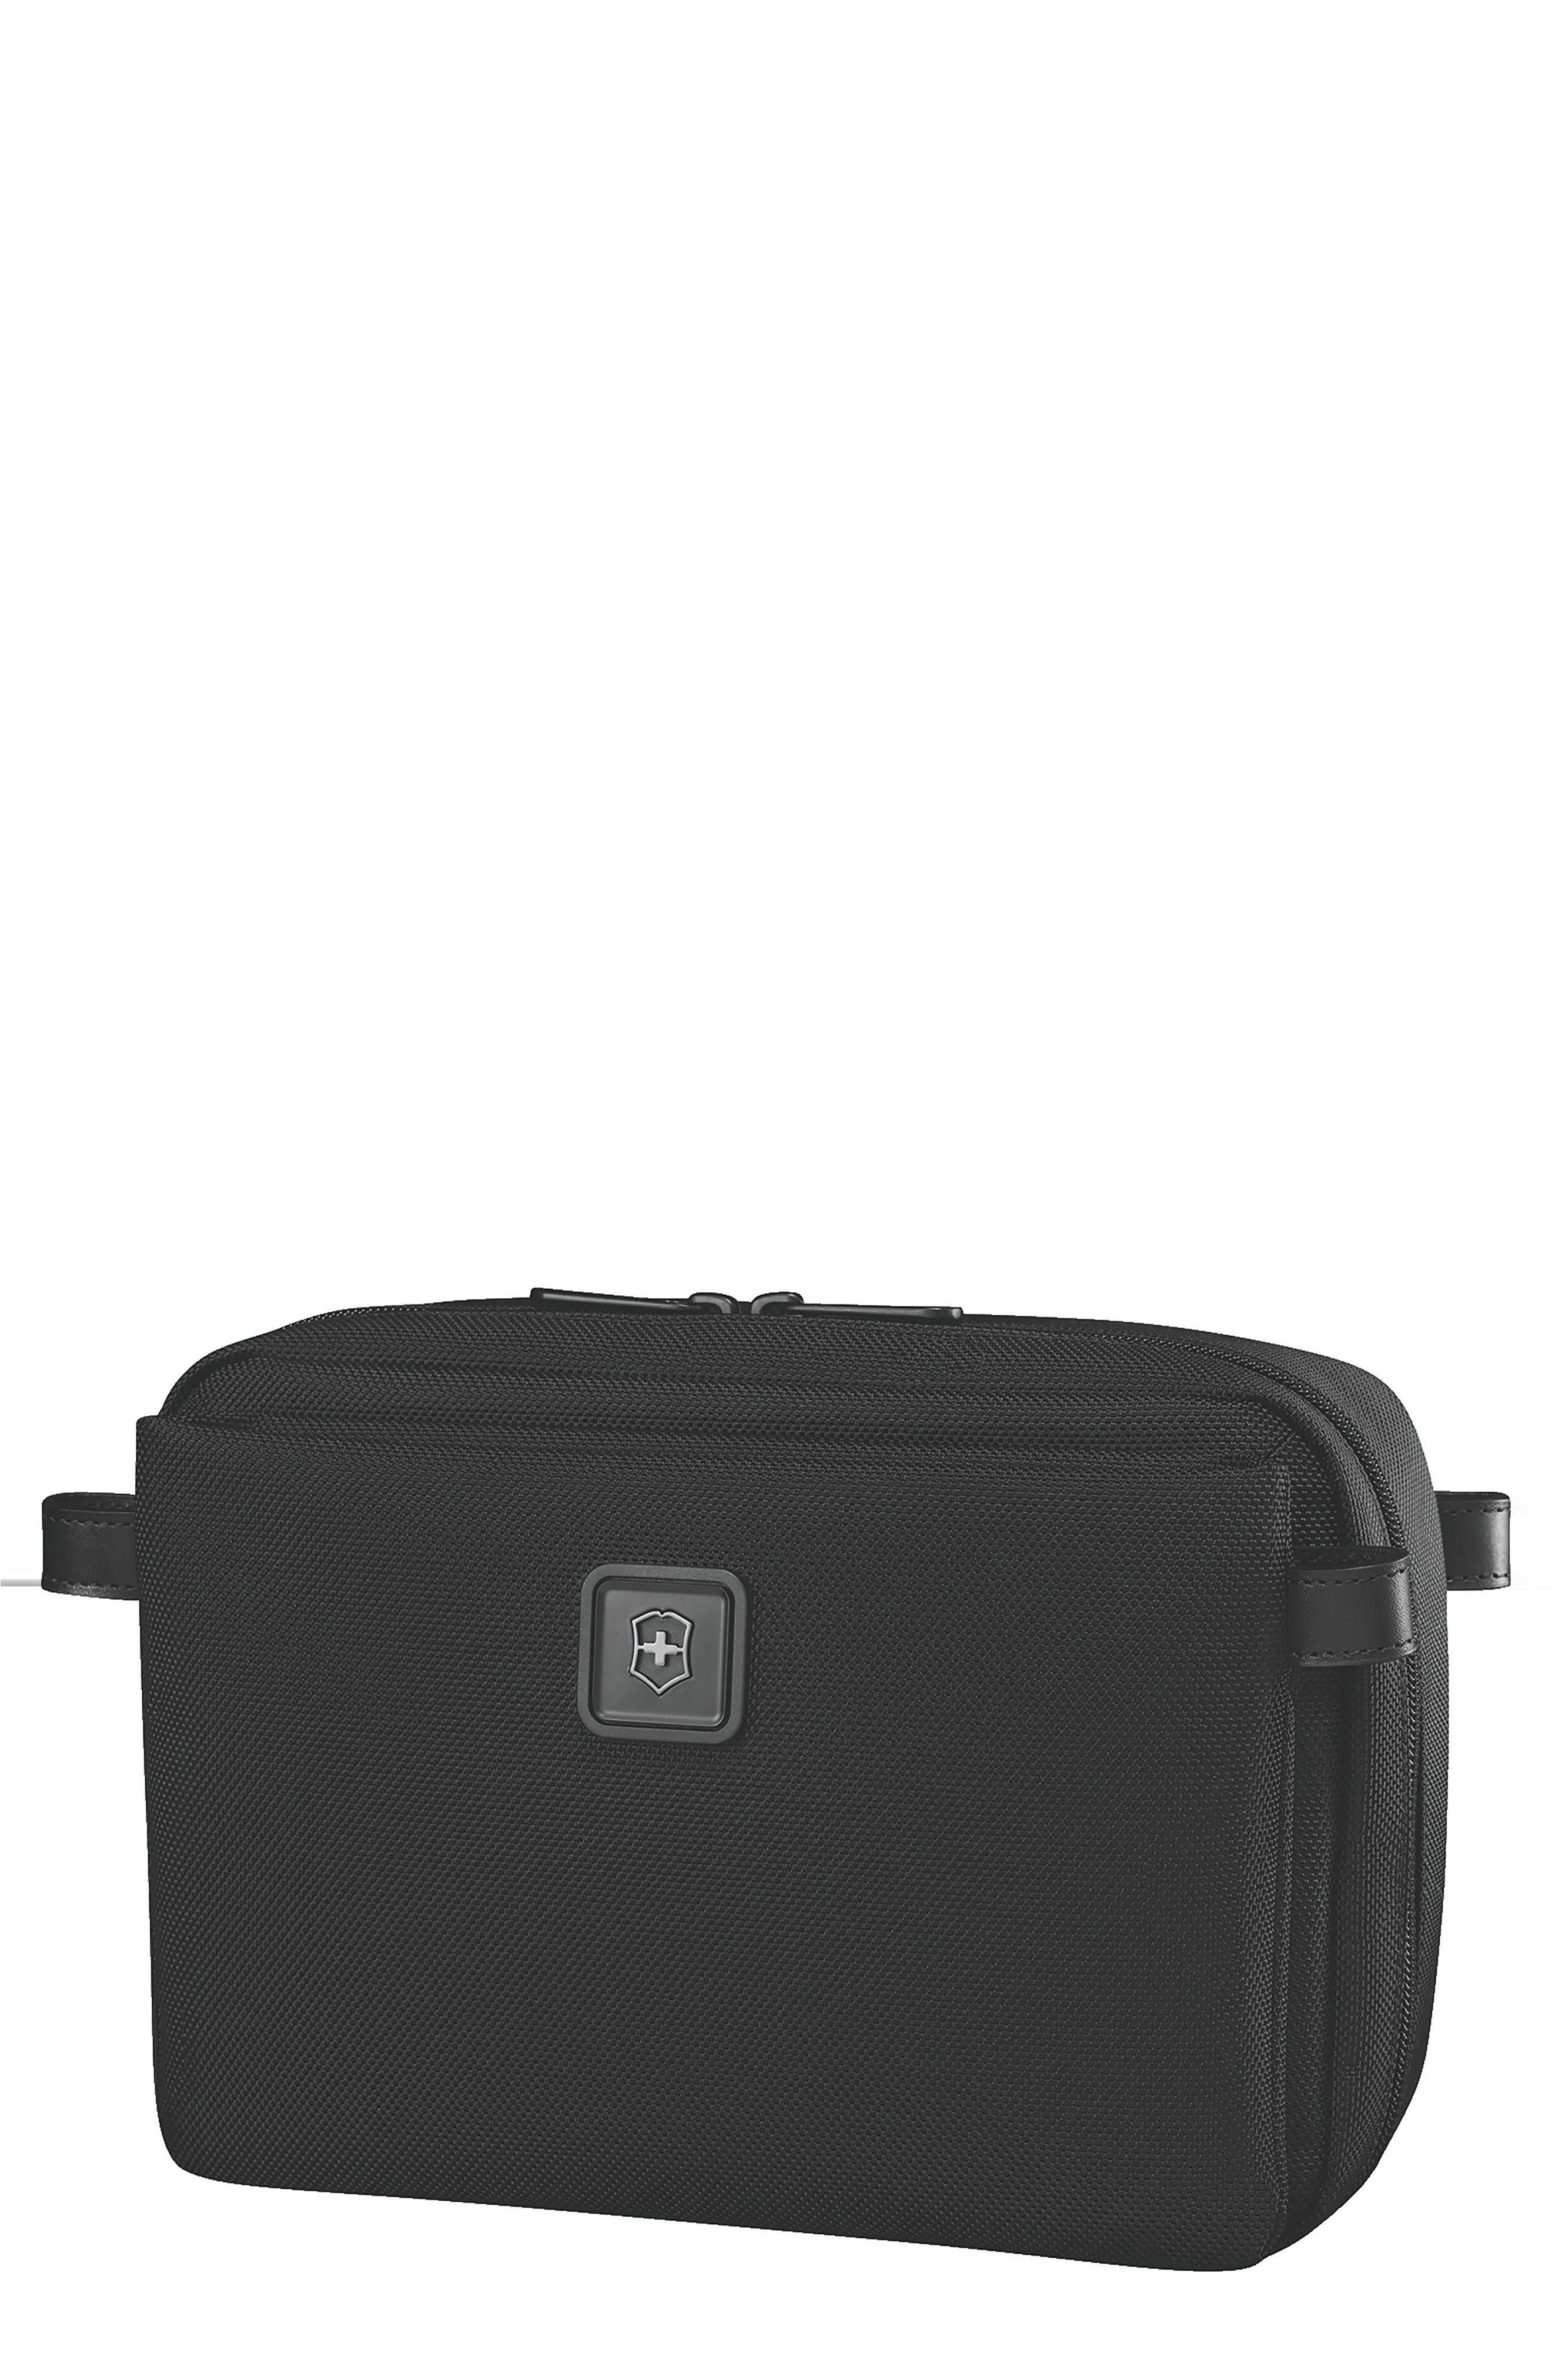 Main Image - Victorinox Swiss Army® Lexicon 2.0 Travel Kit